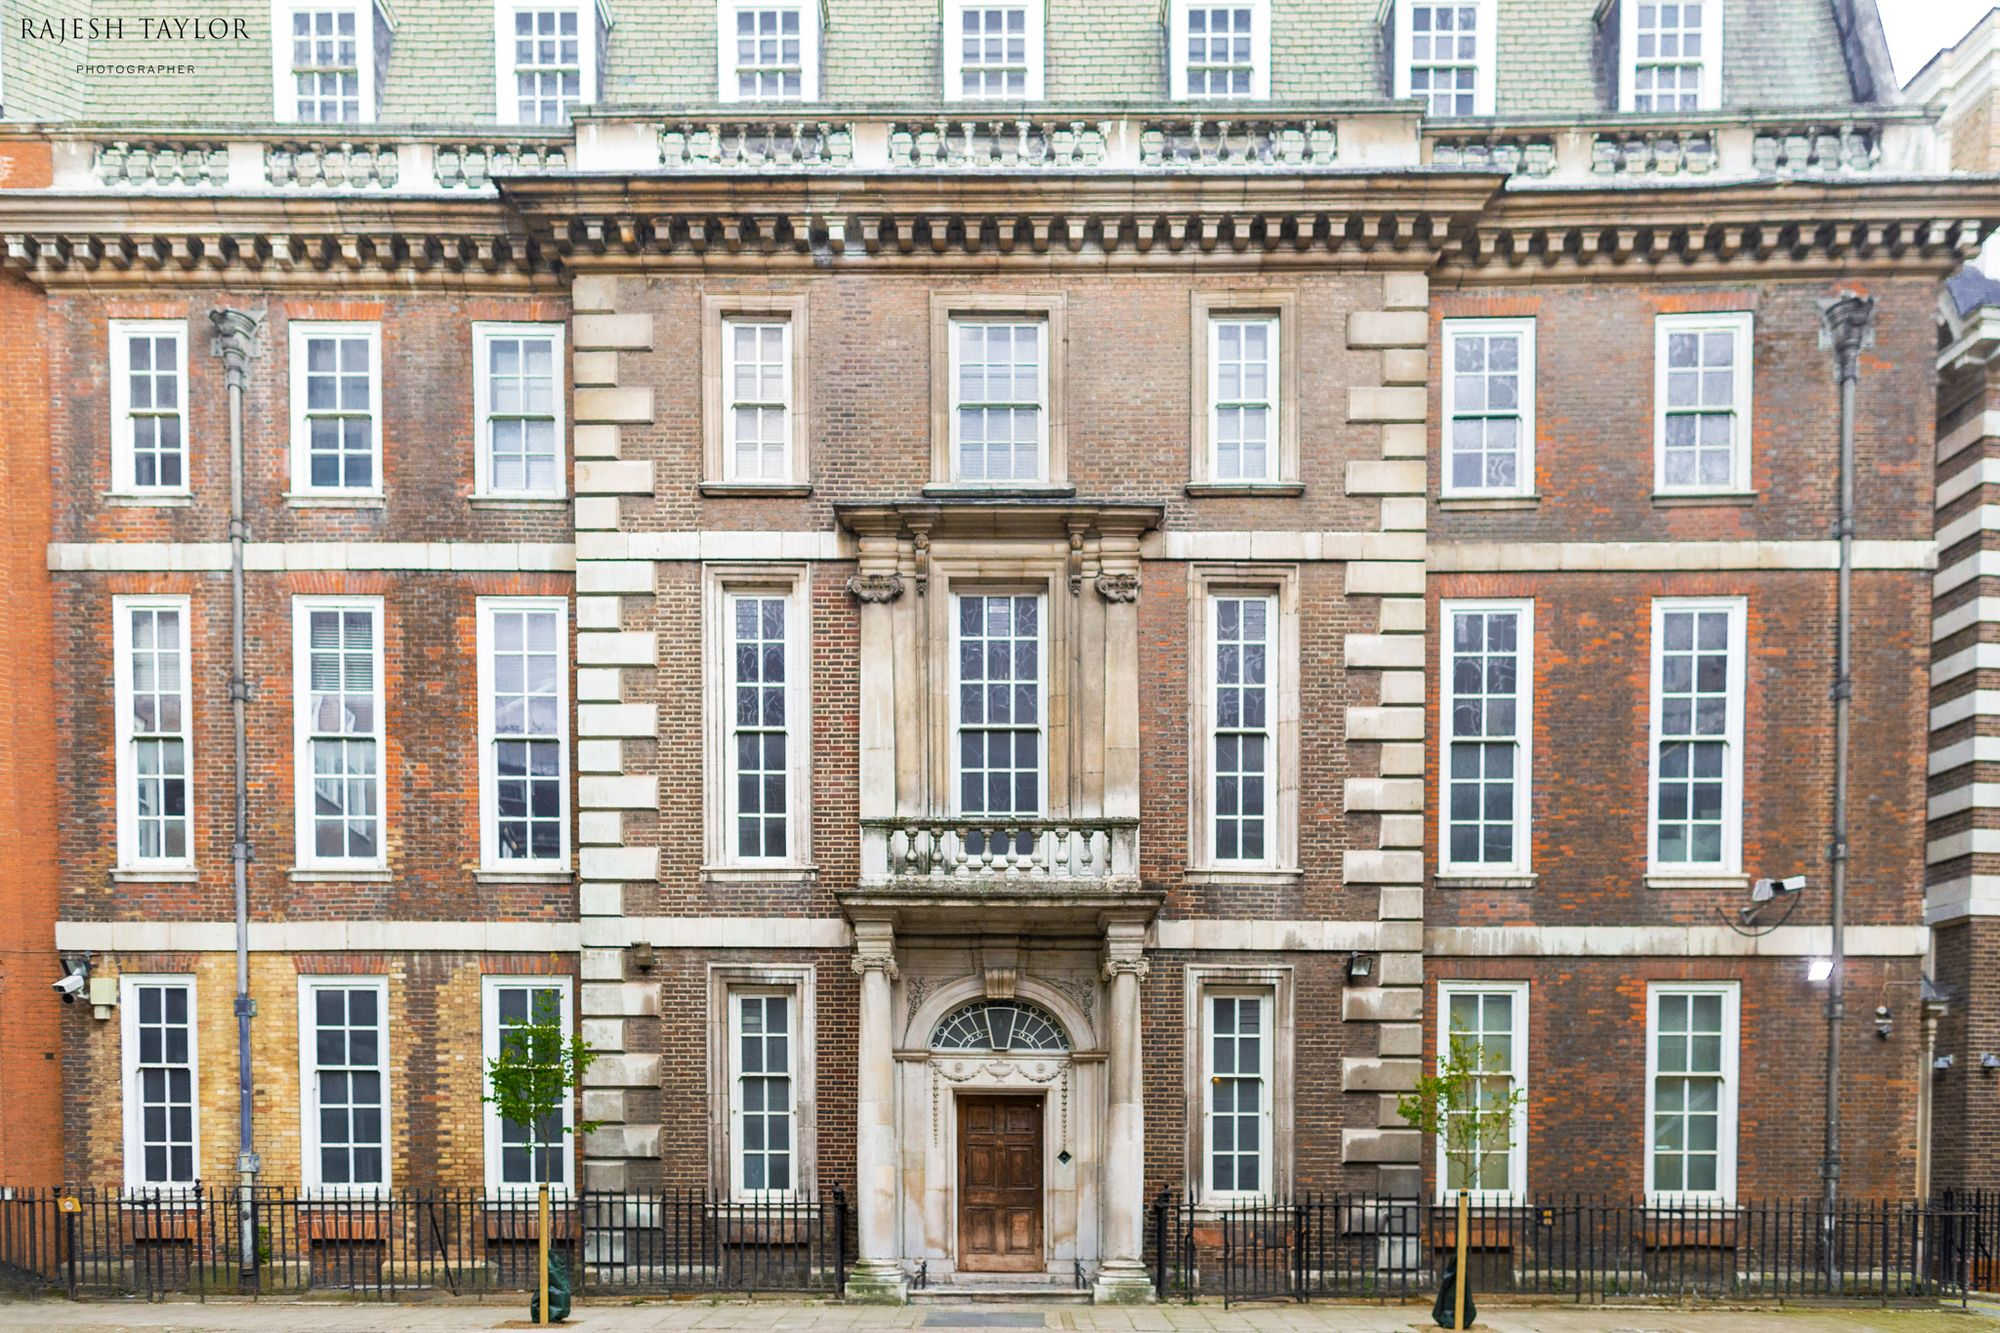 Harrington House on Craig's Court © Rajesh Taylor